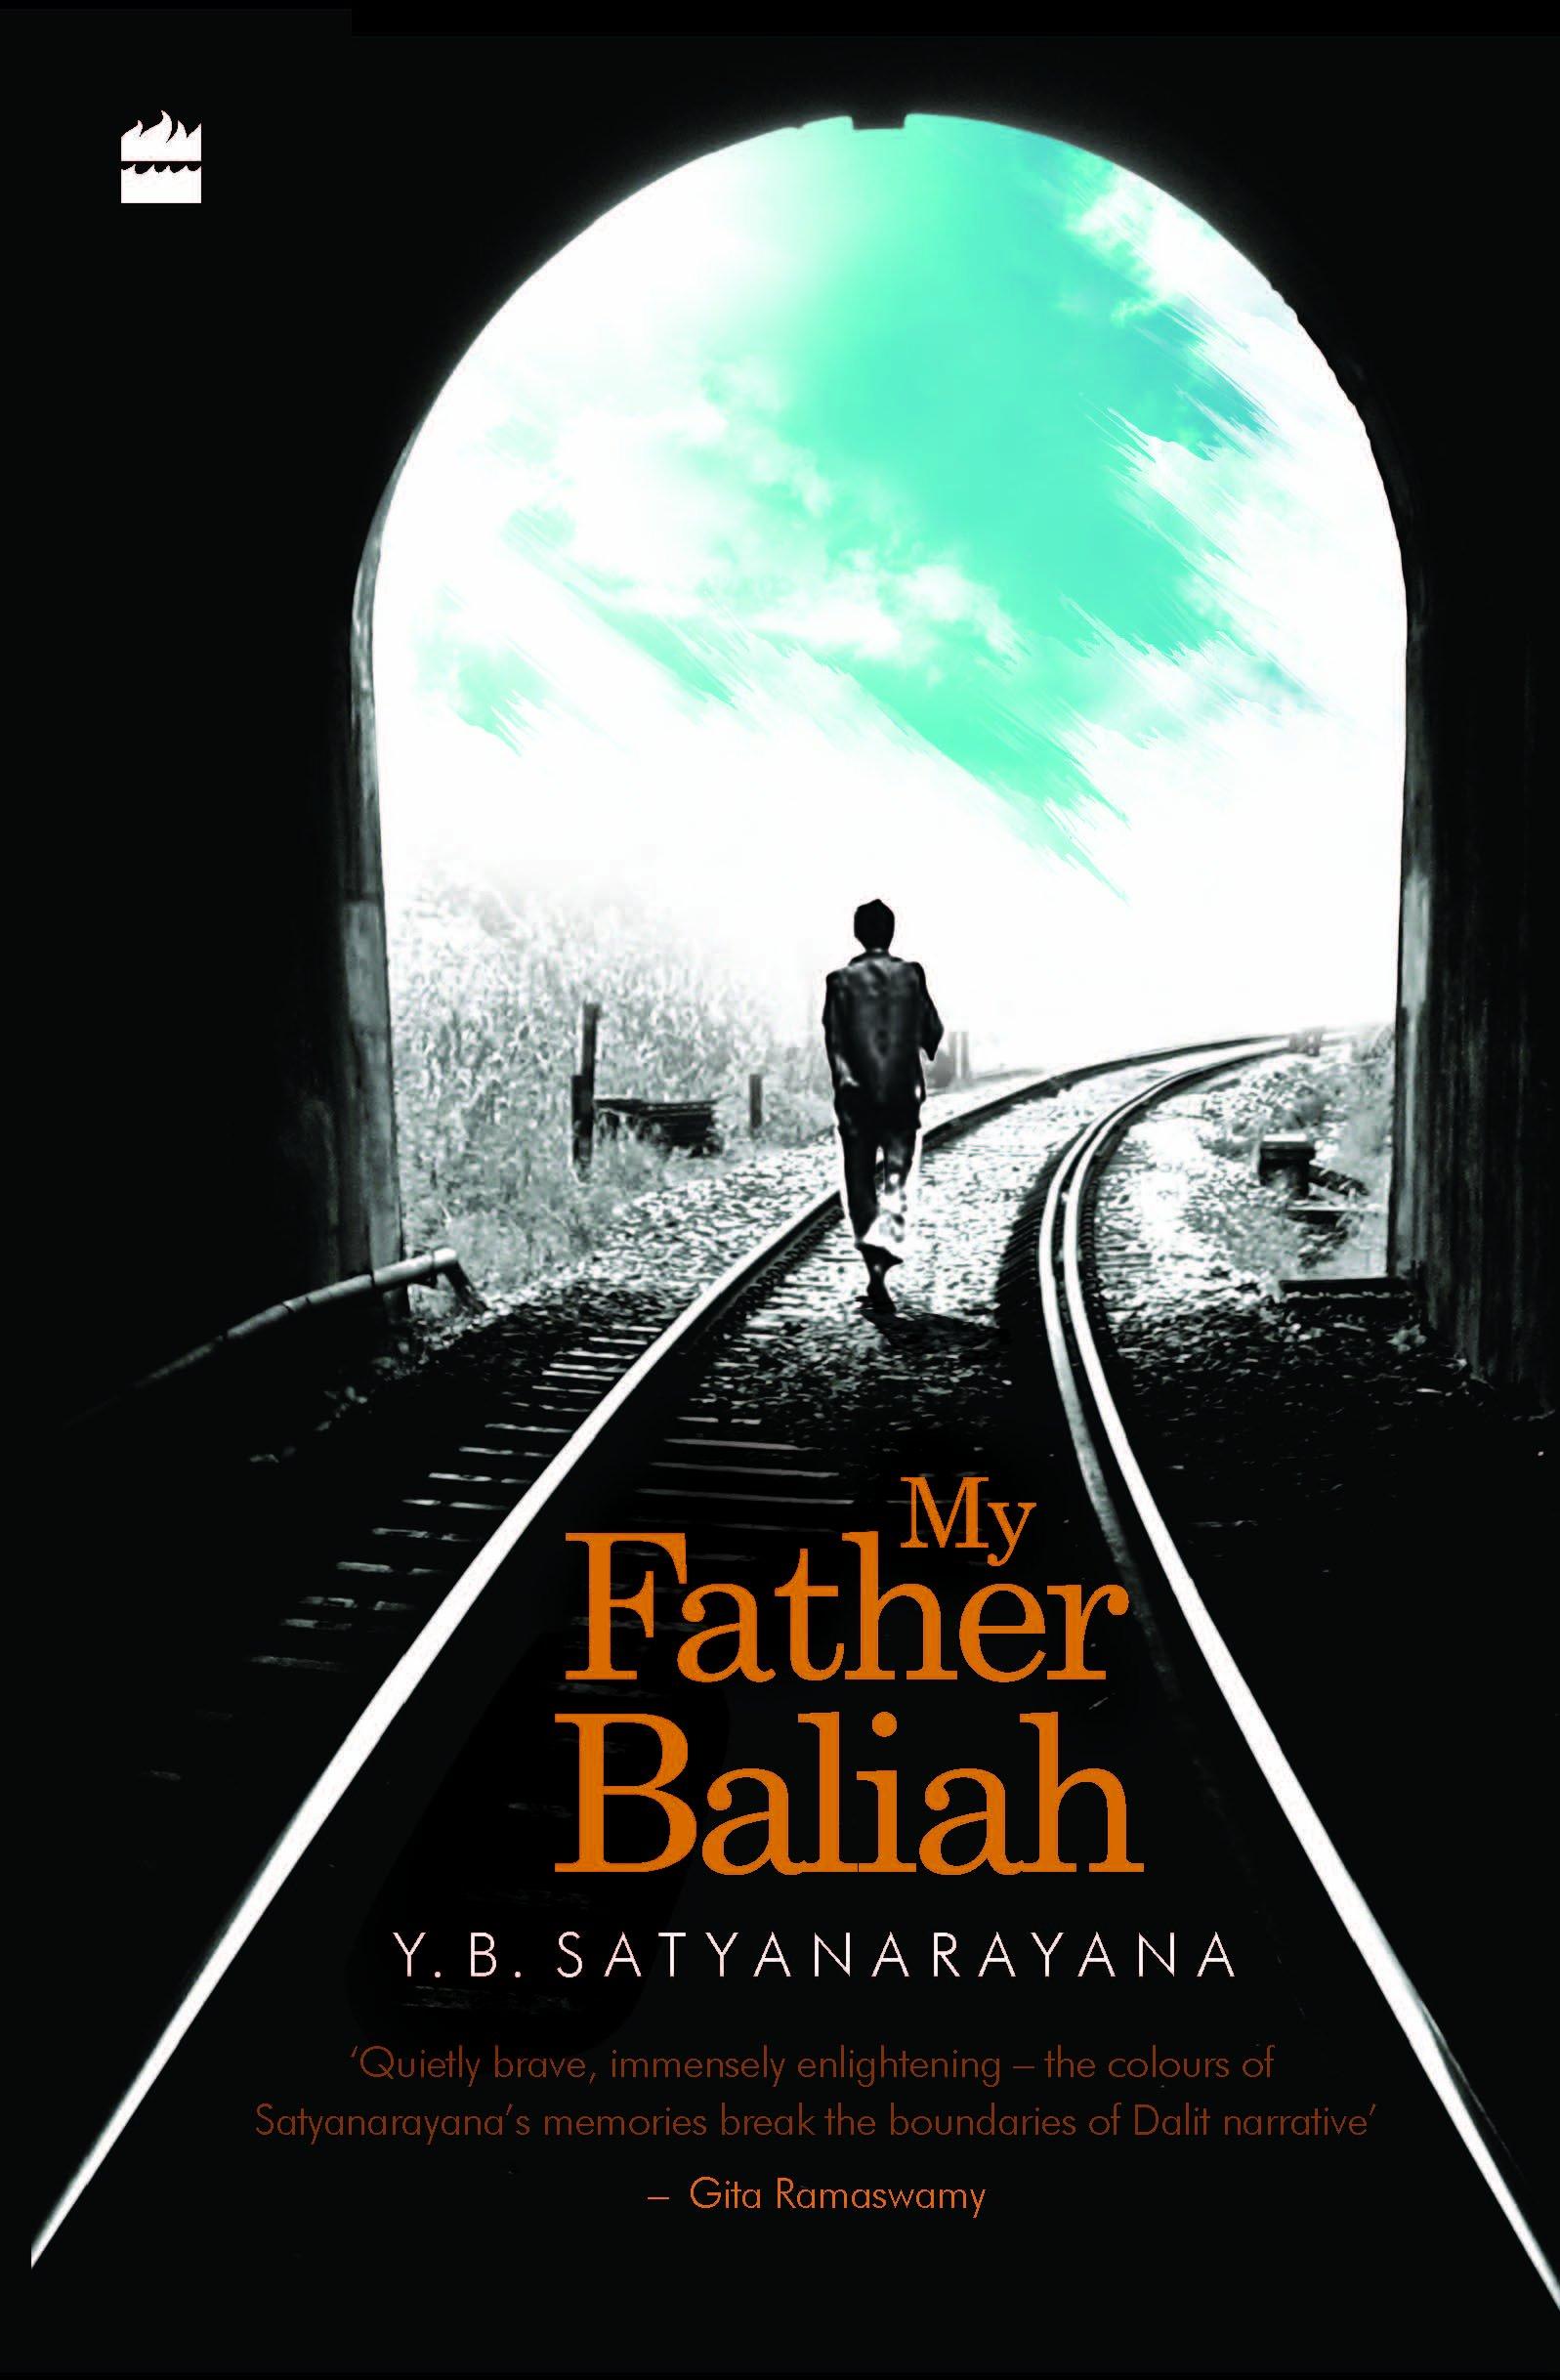 My Father Balaiah. Credit: Amazon.in